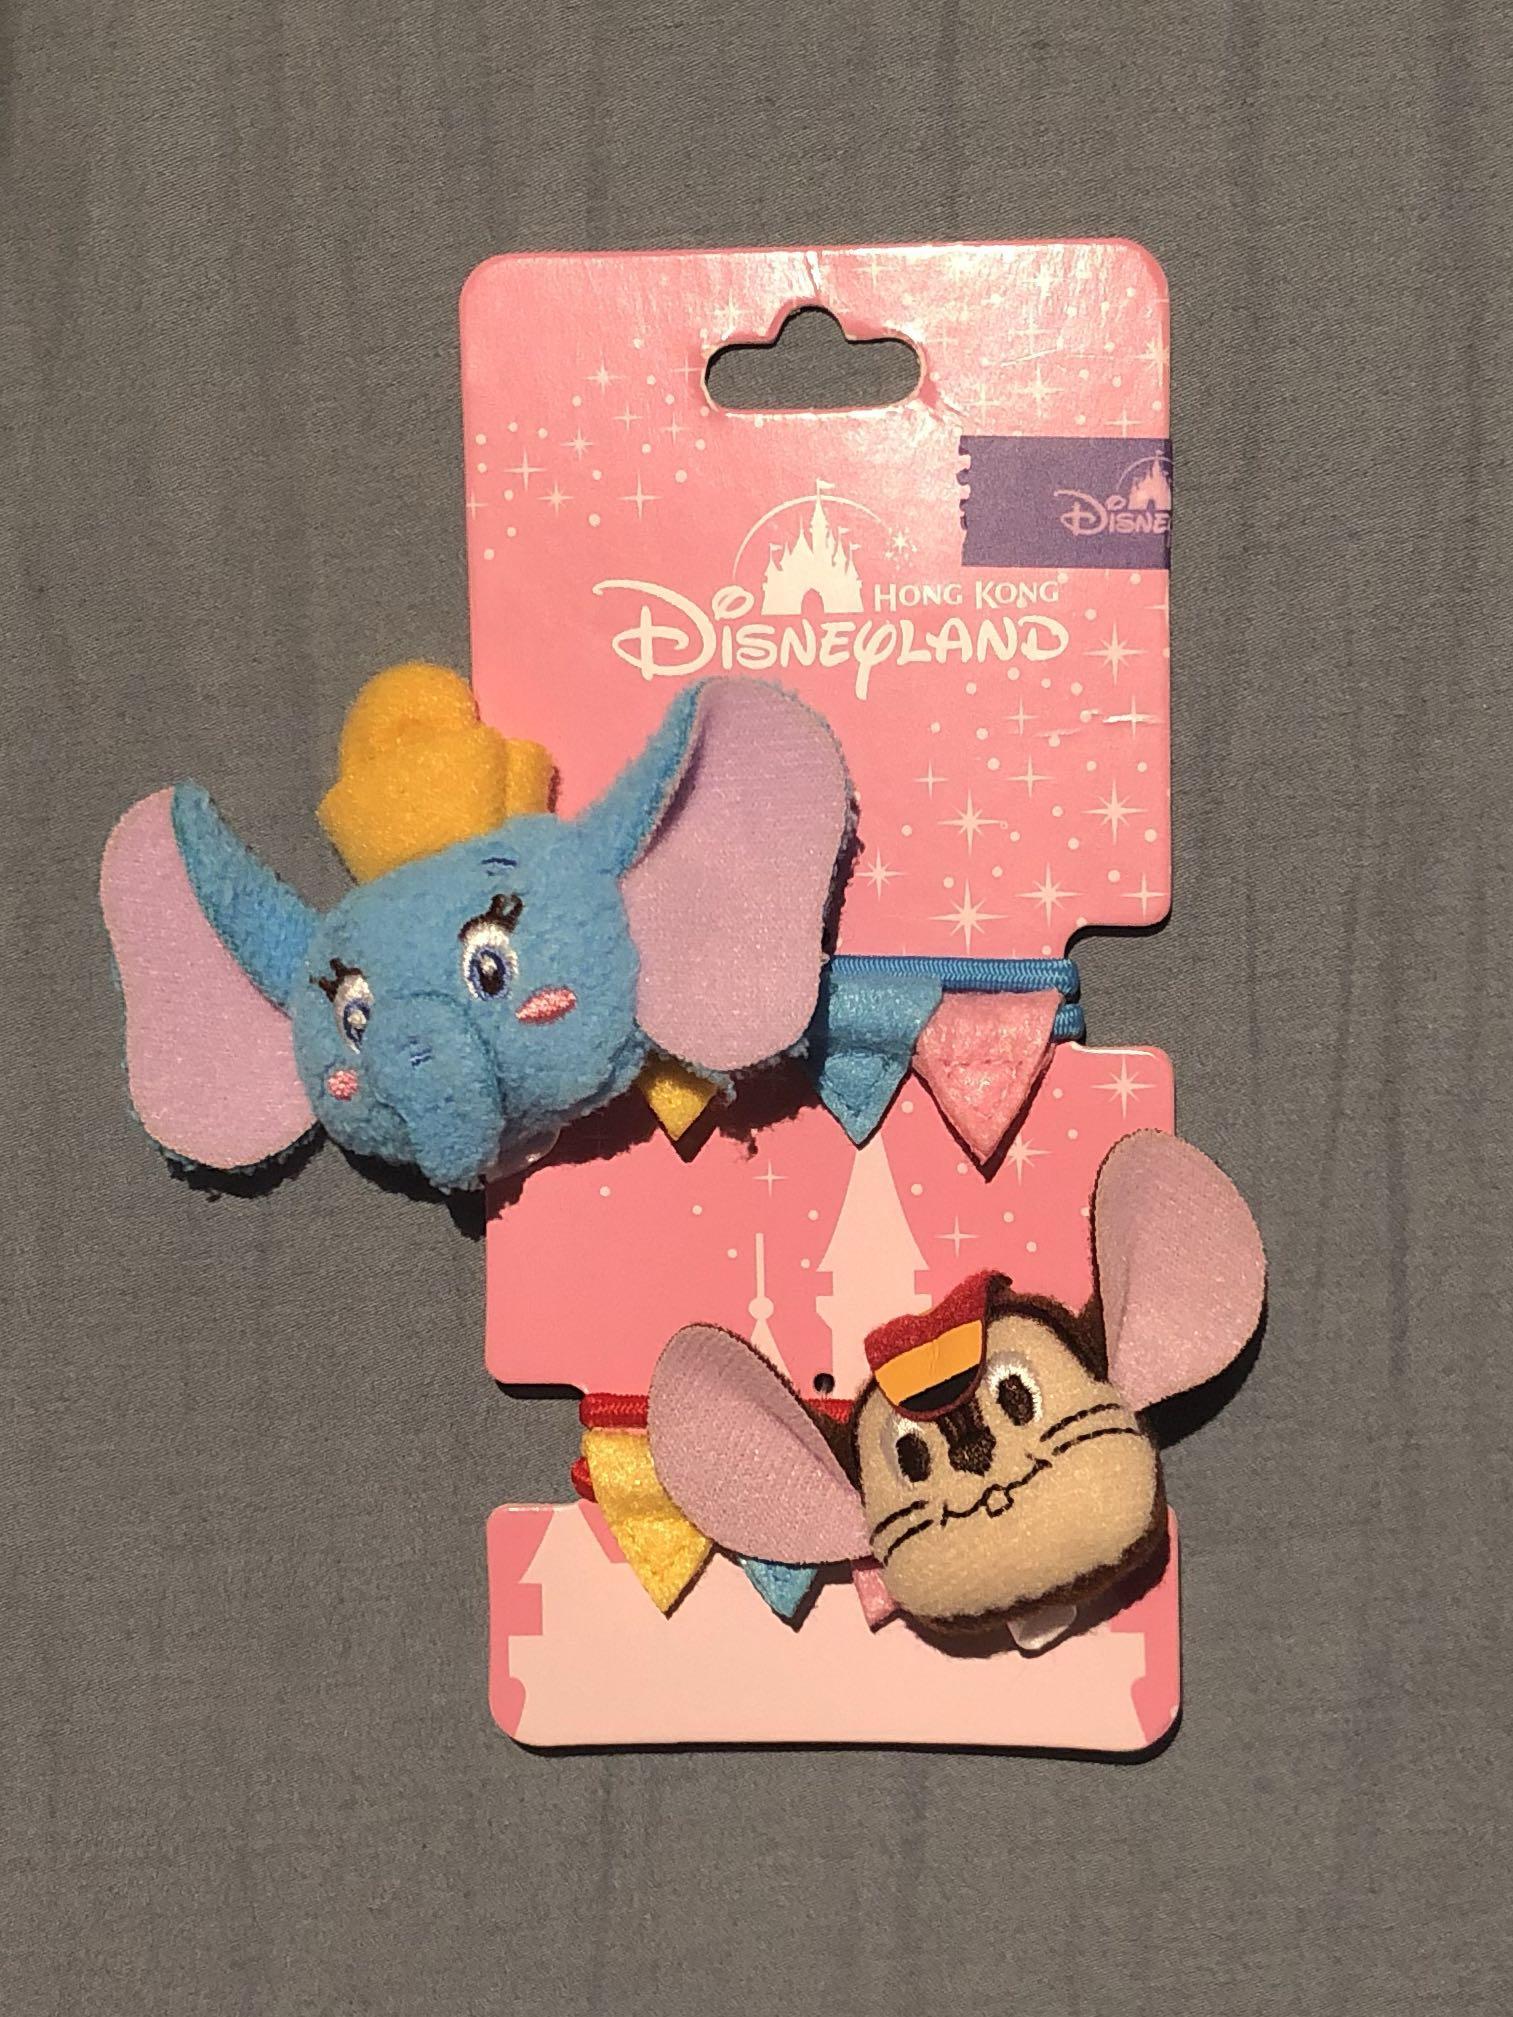 Hong Kong Disneyland Dumbo Timothy hair accessories 香港迪士尼樂園 小飛象 頭飾 髮圈 橡筋